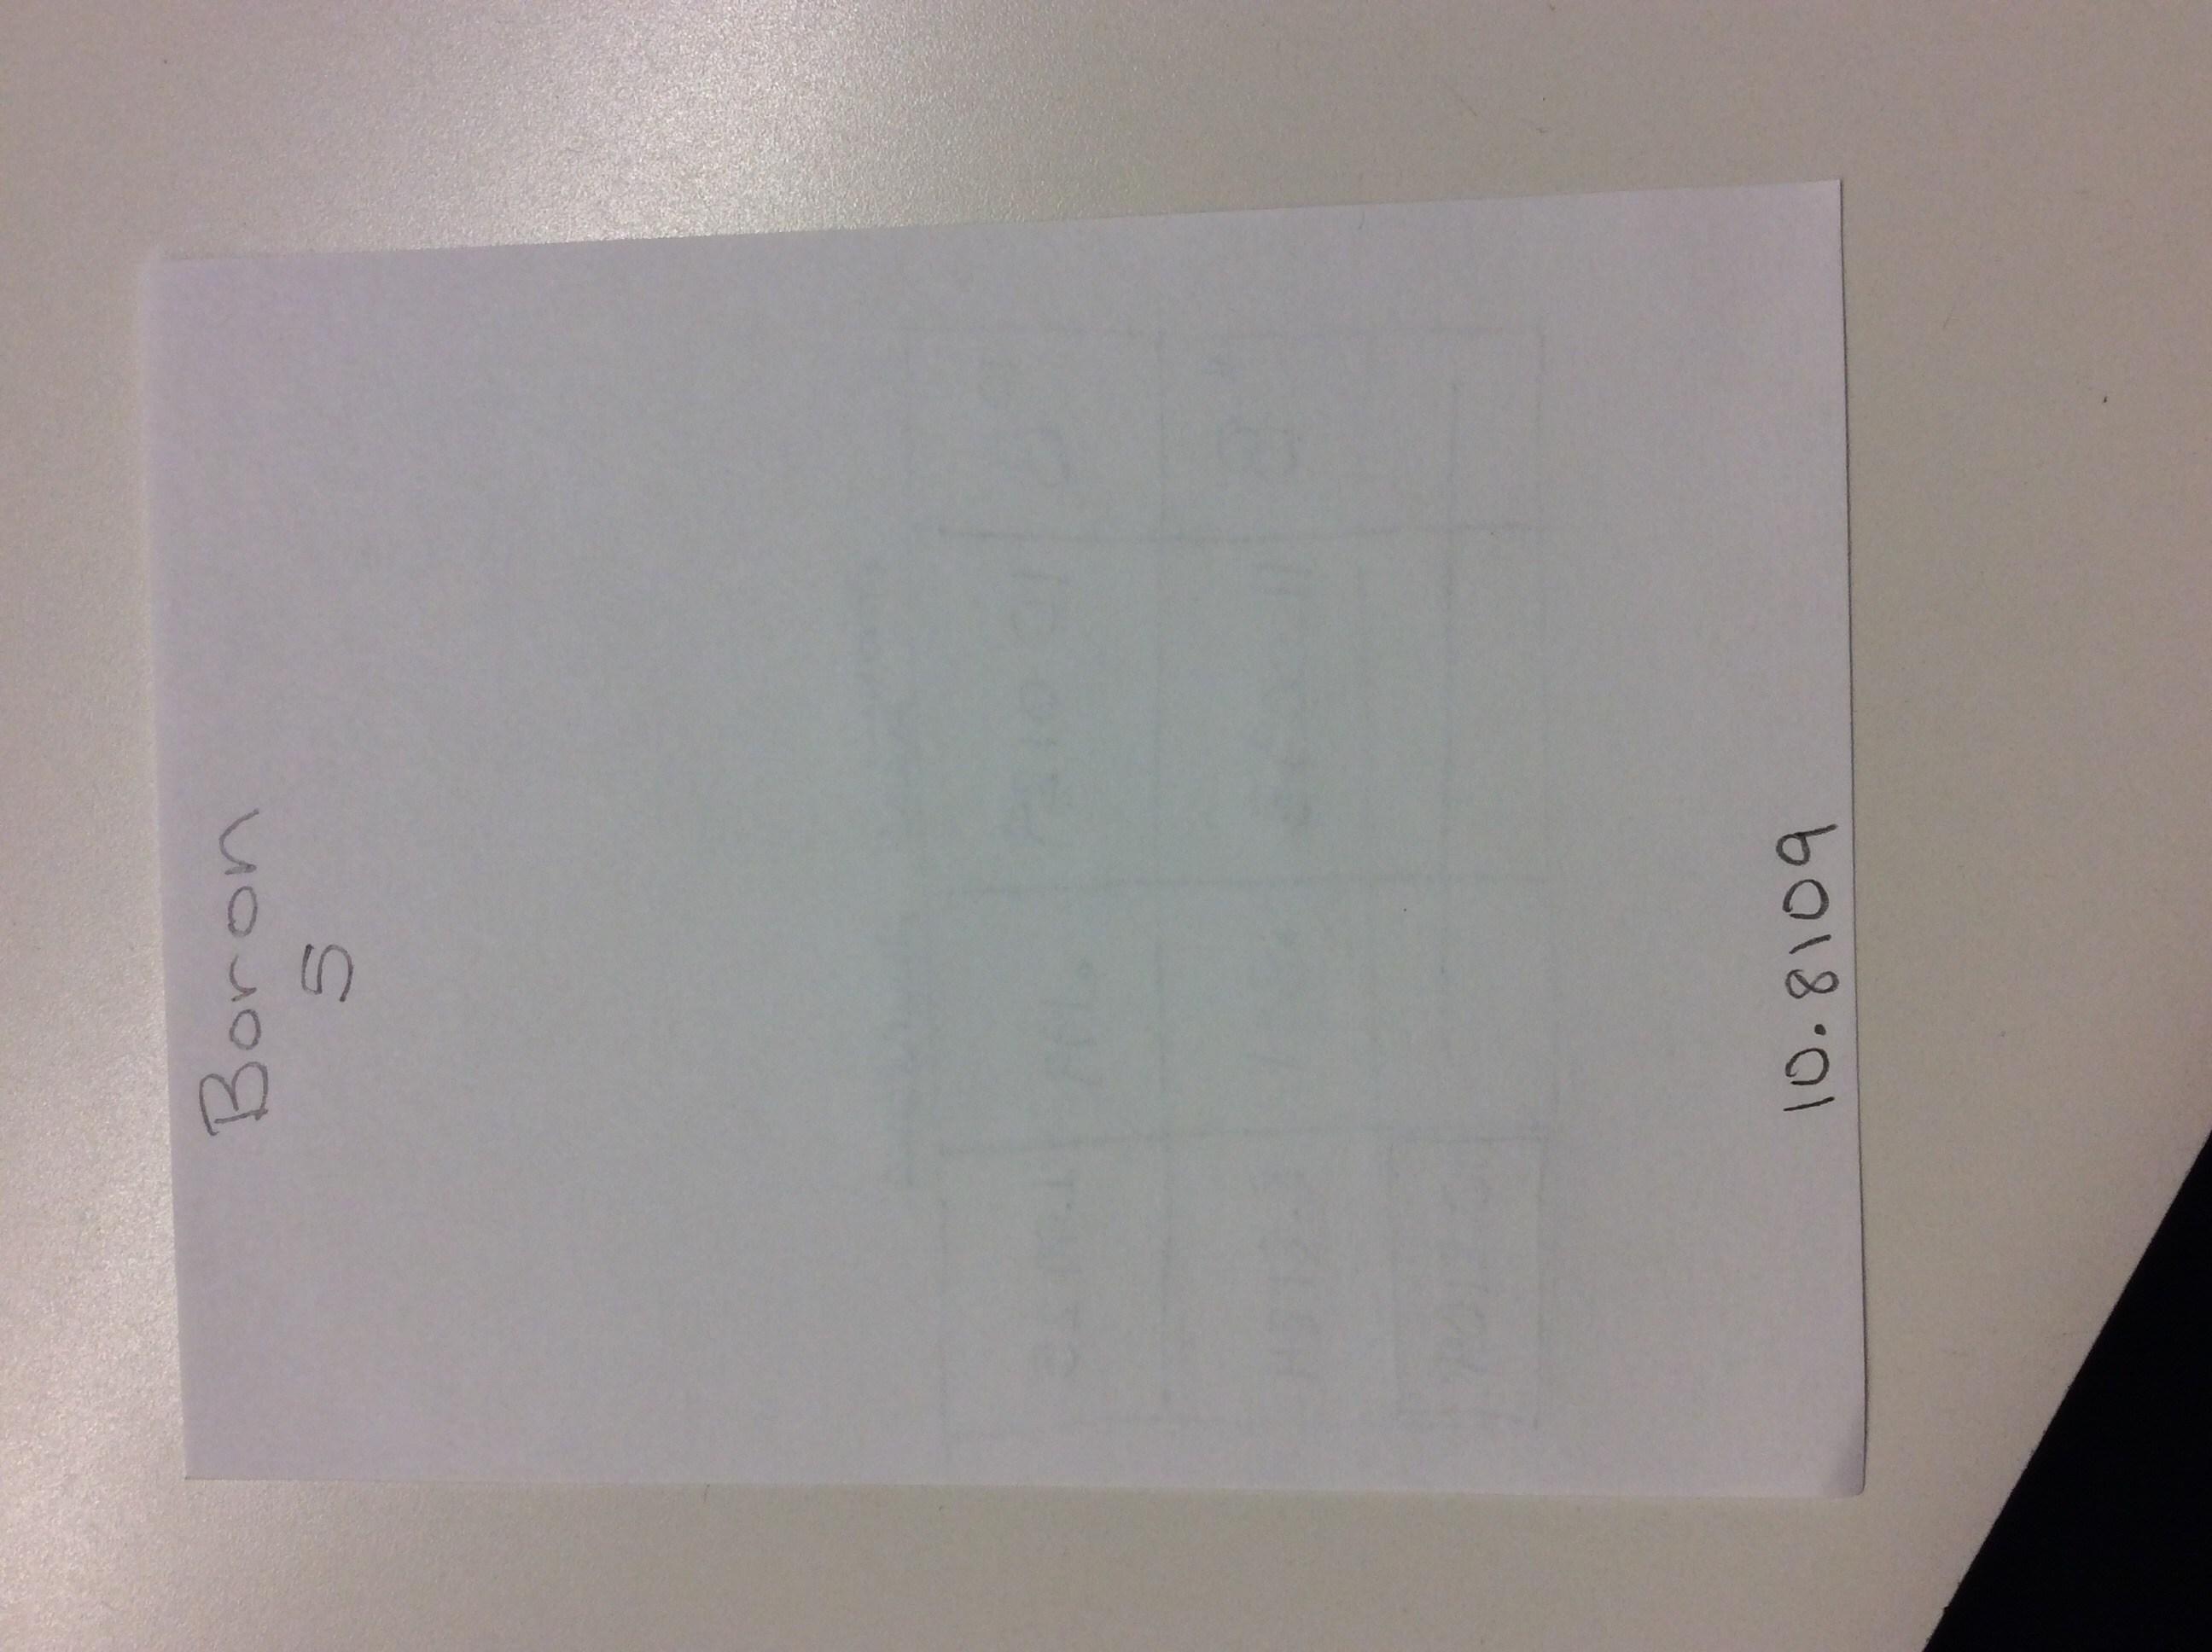 Worksheet Limiting Reactants